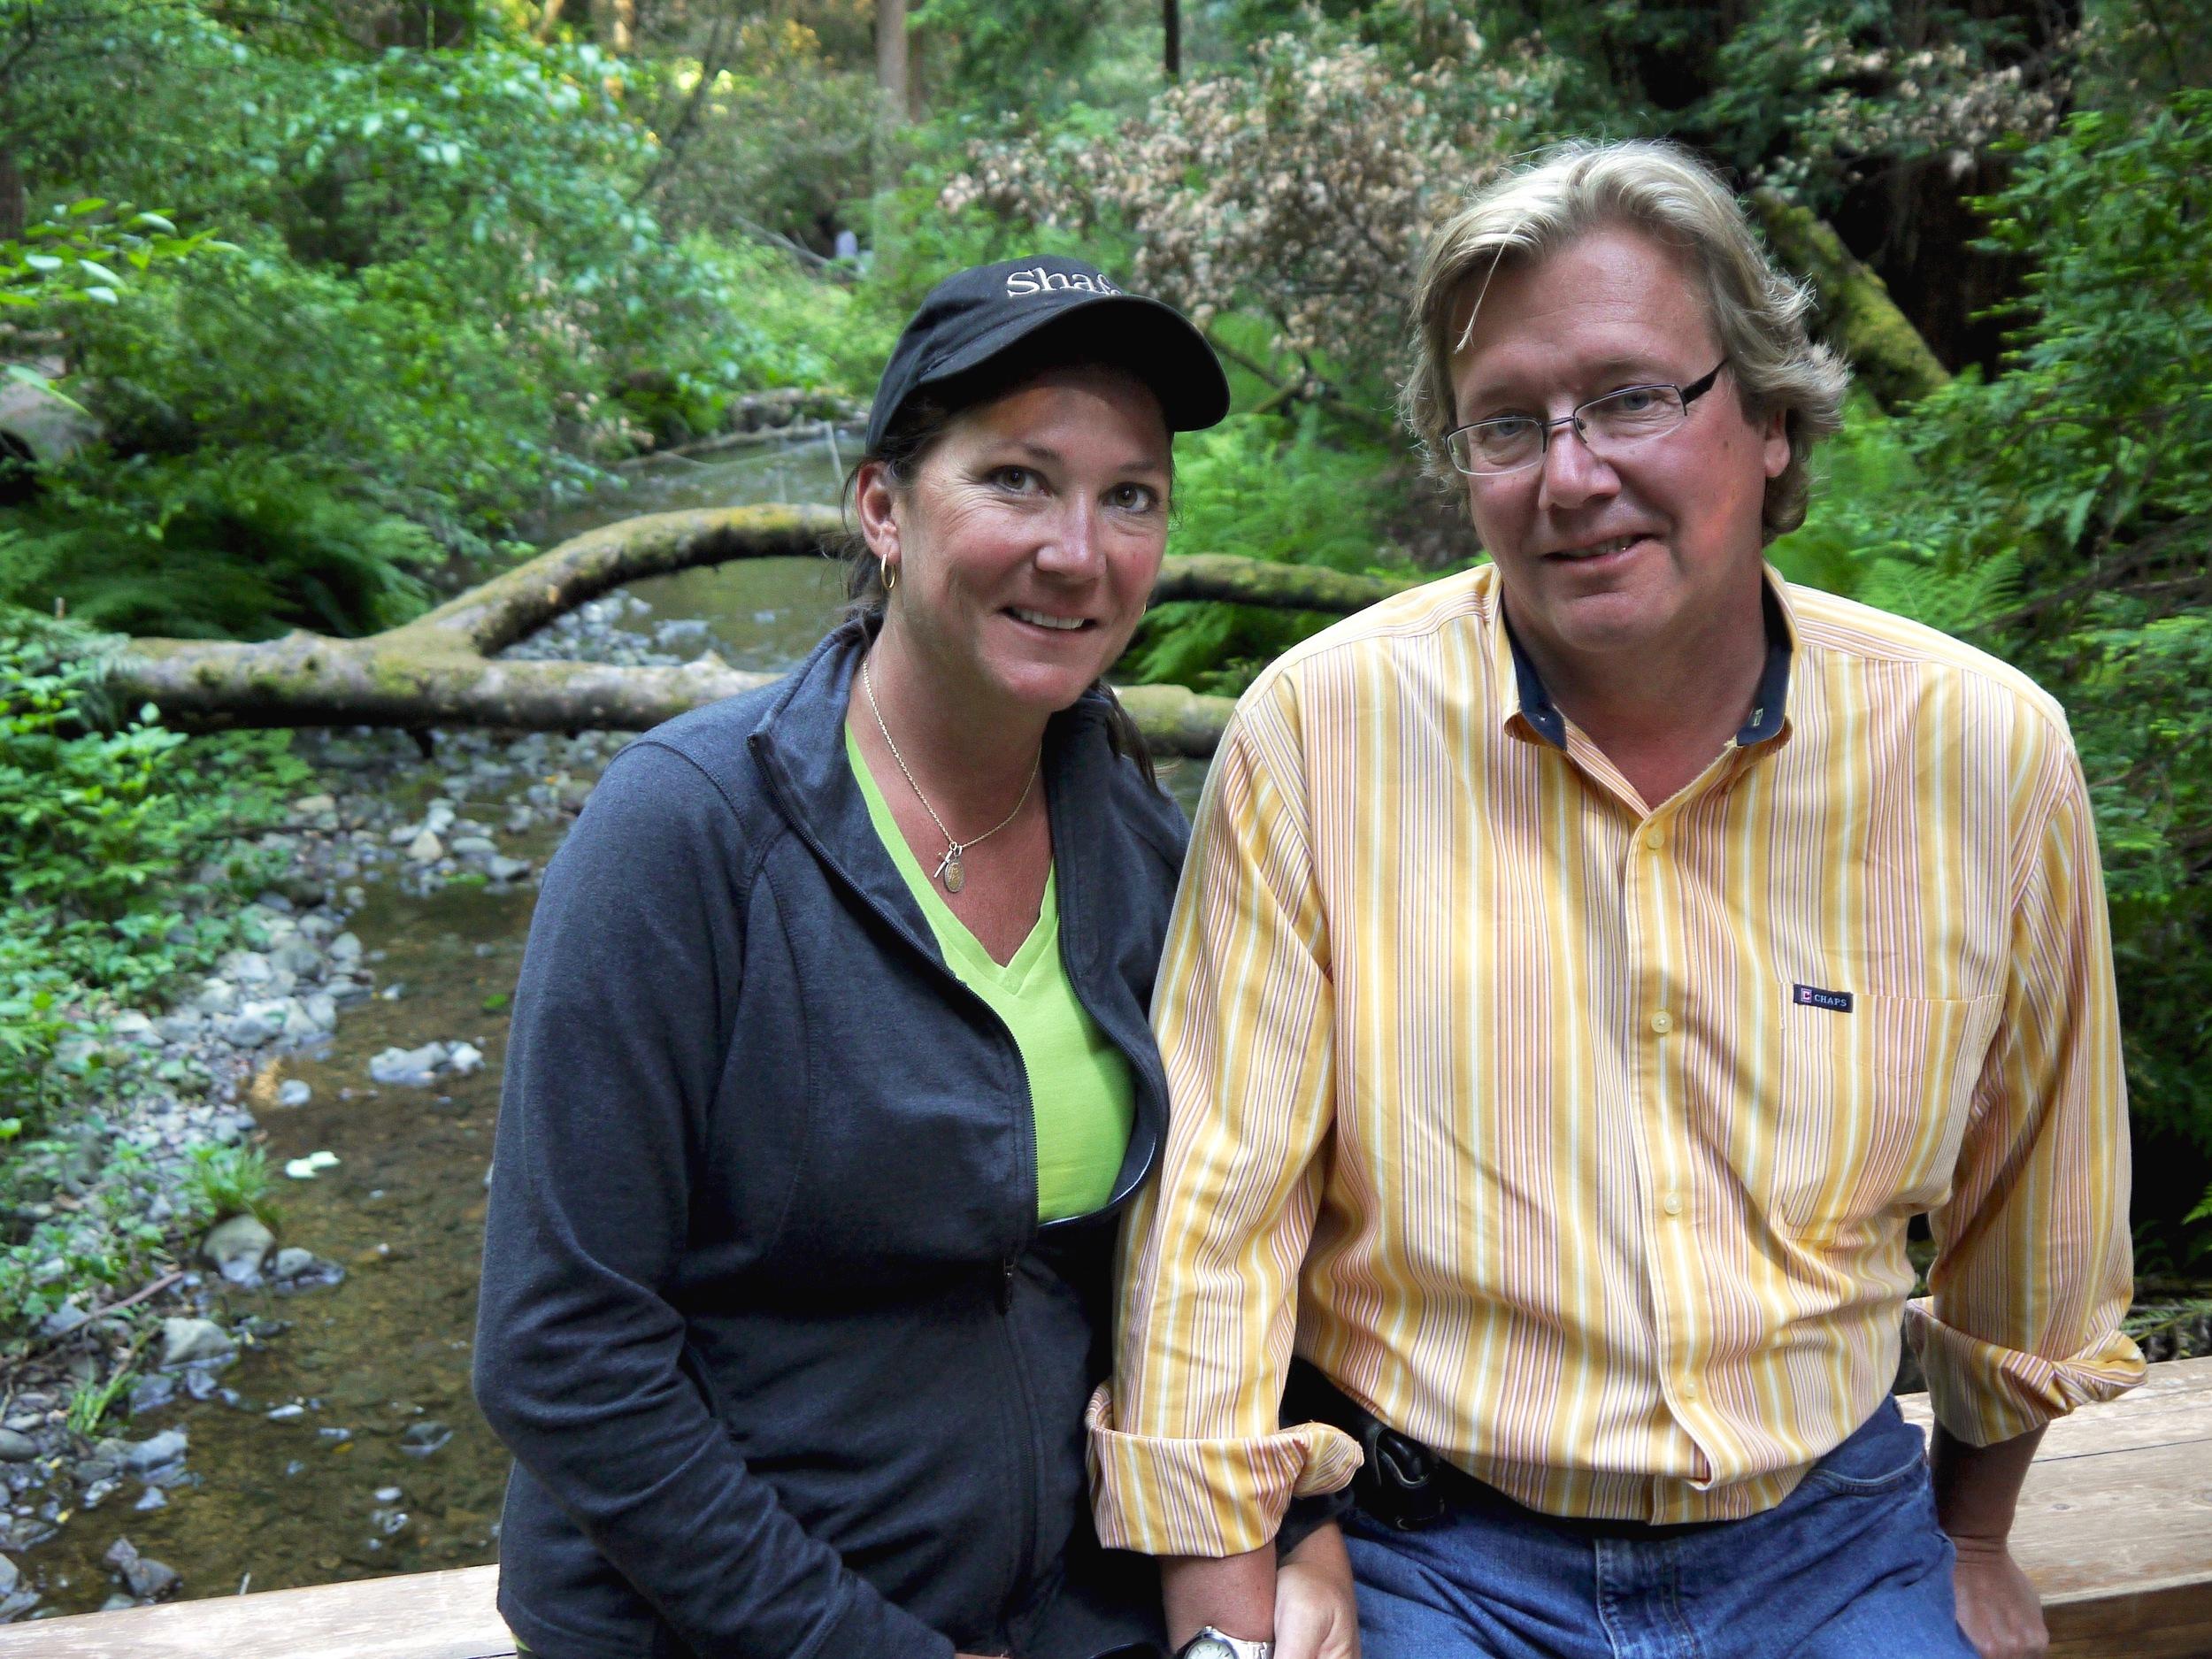 Lisa and Brian Kovach relax in the placid grandeur of Muir Woods.